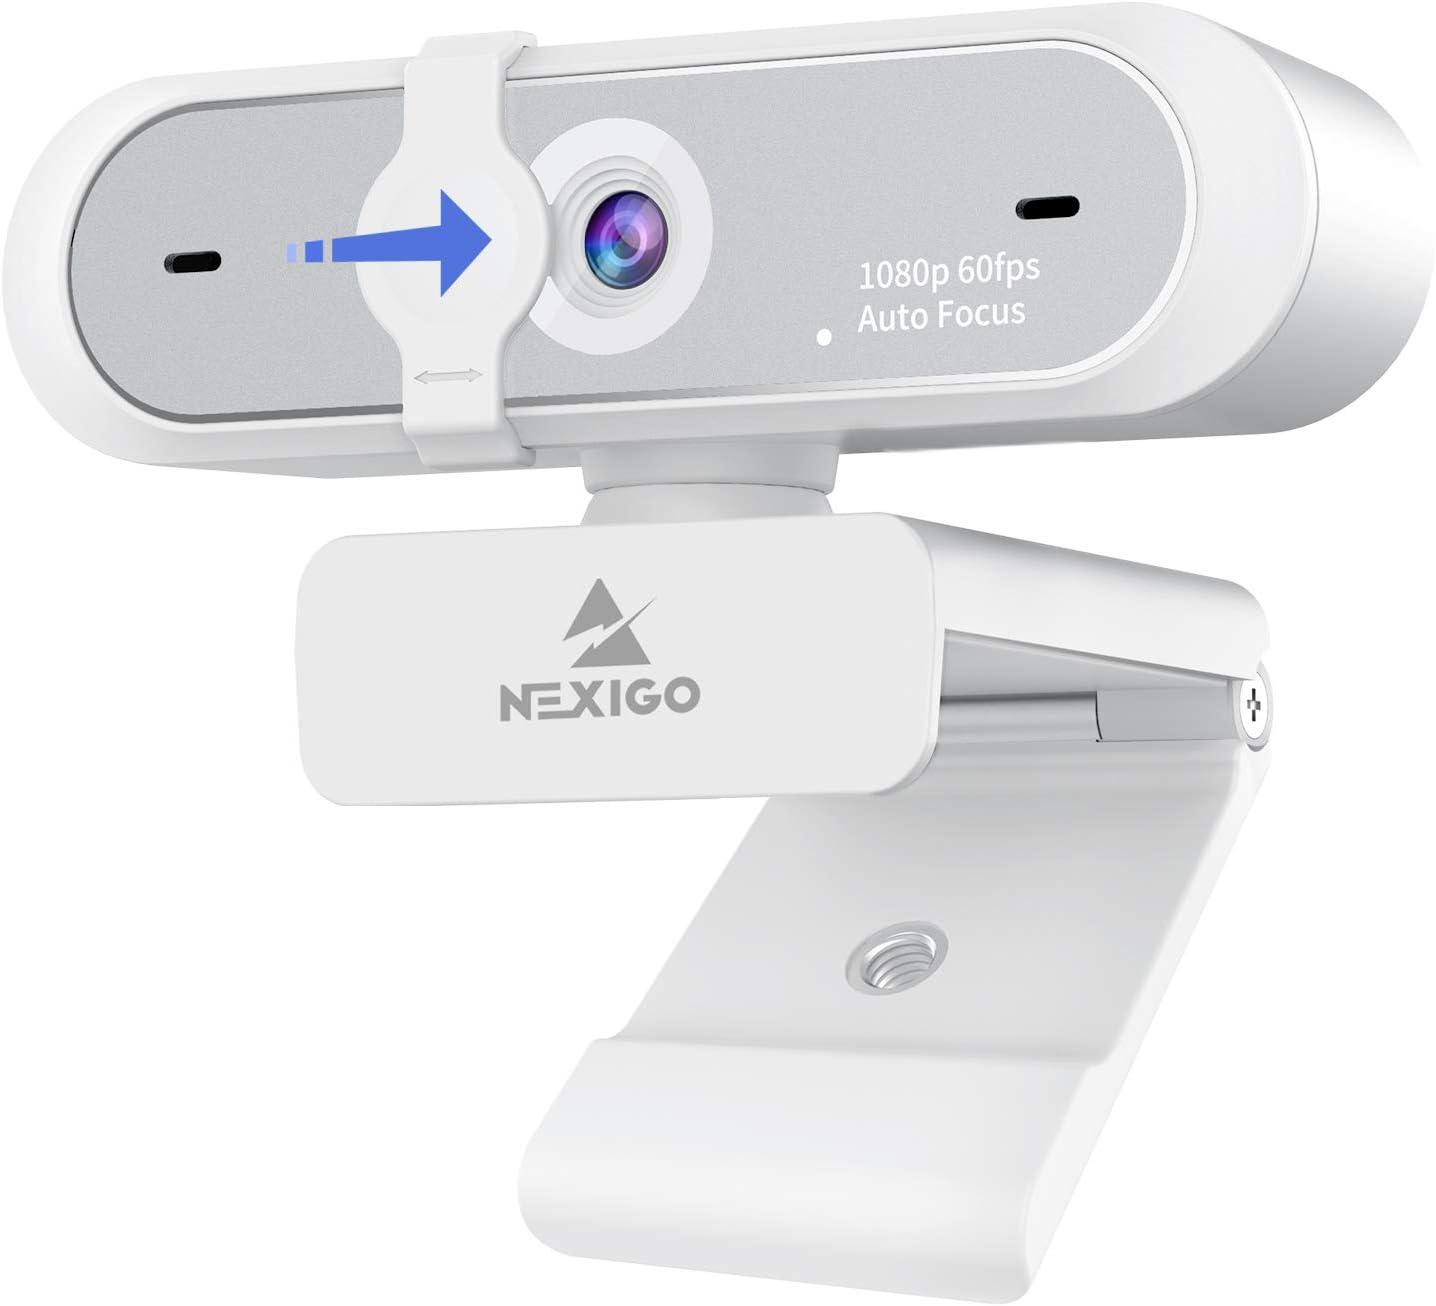 60FPS AutoFocus 1080P Webcam with Software Control, Dual Microphone & Cover, 2021 NexiGo N660P Pro HD USB Computer Web Camera, for OBS Zoom Skype FaceTime Teams, White